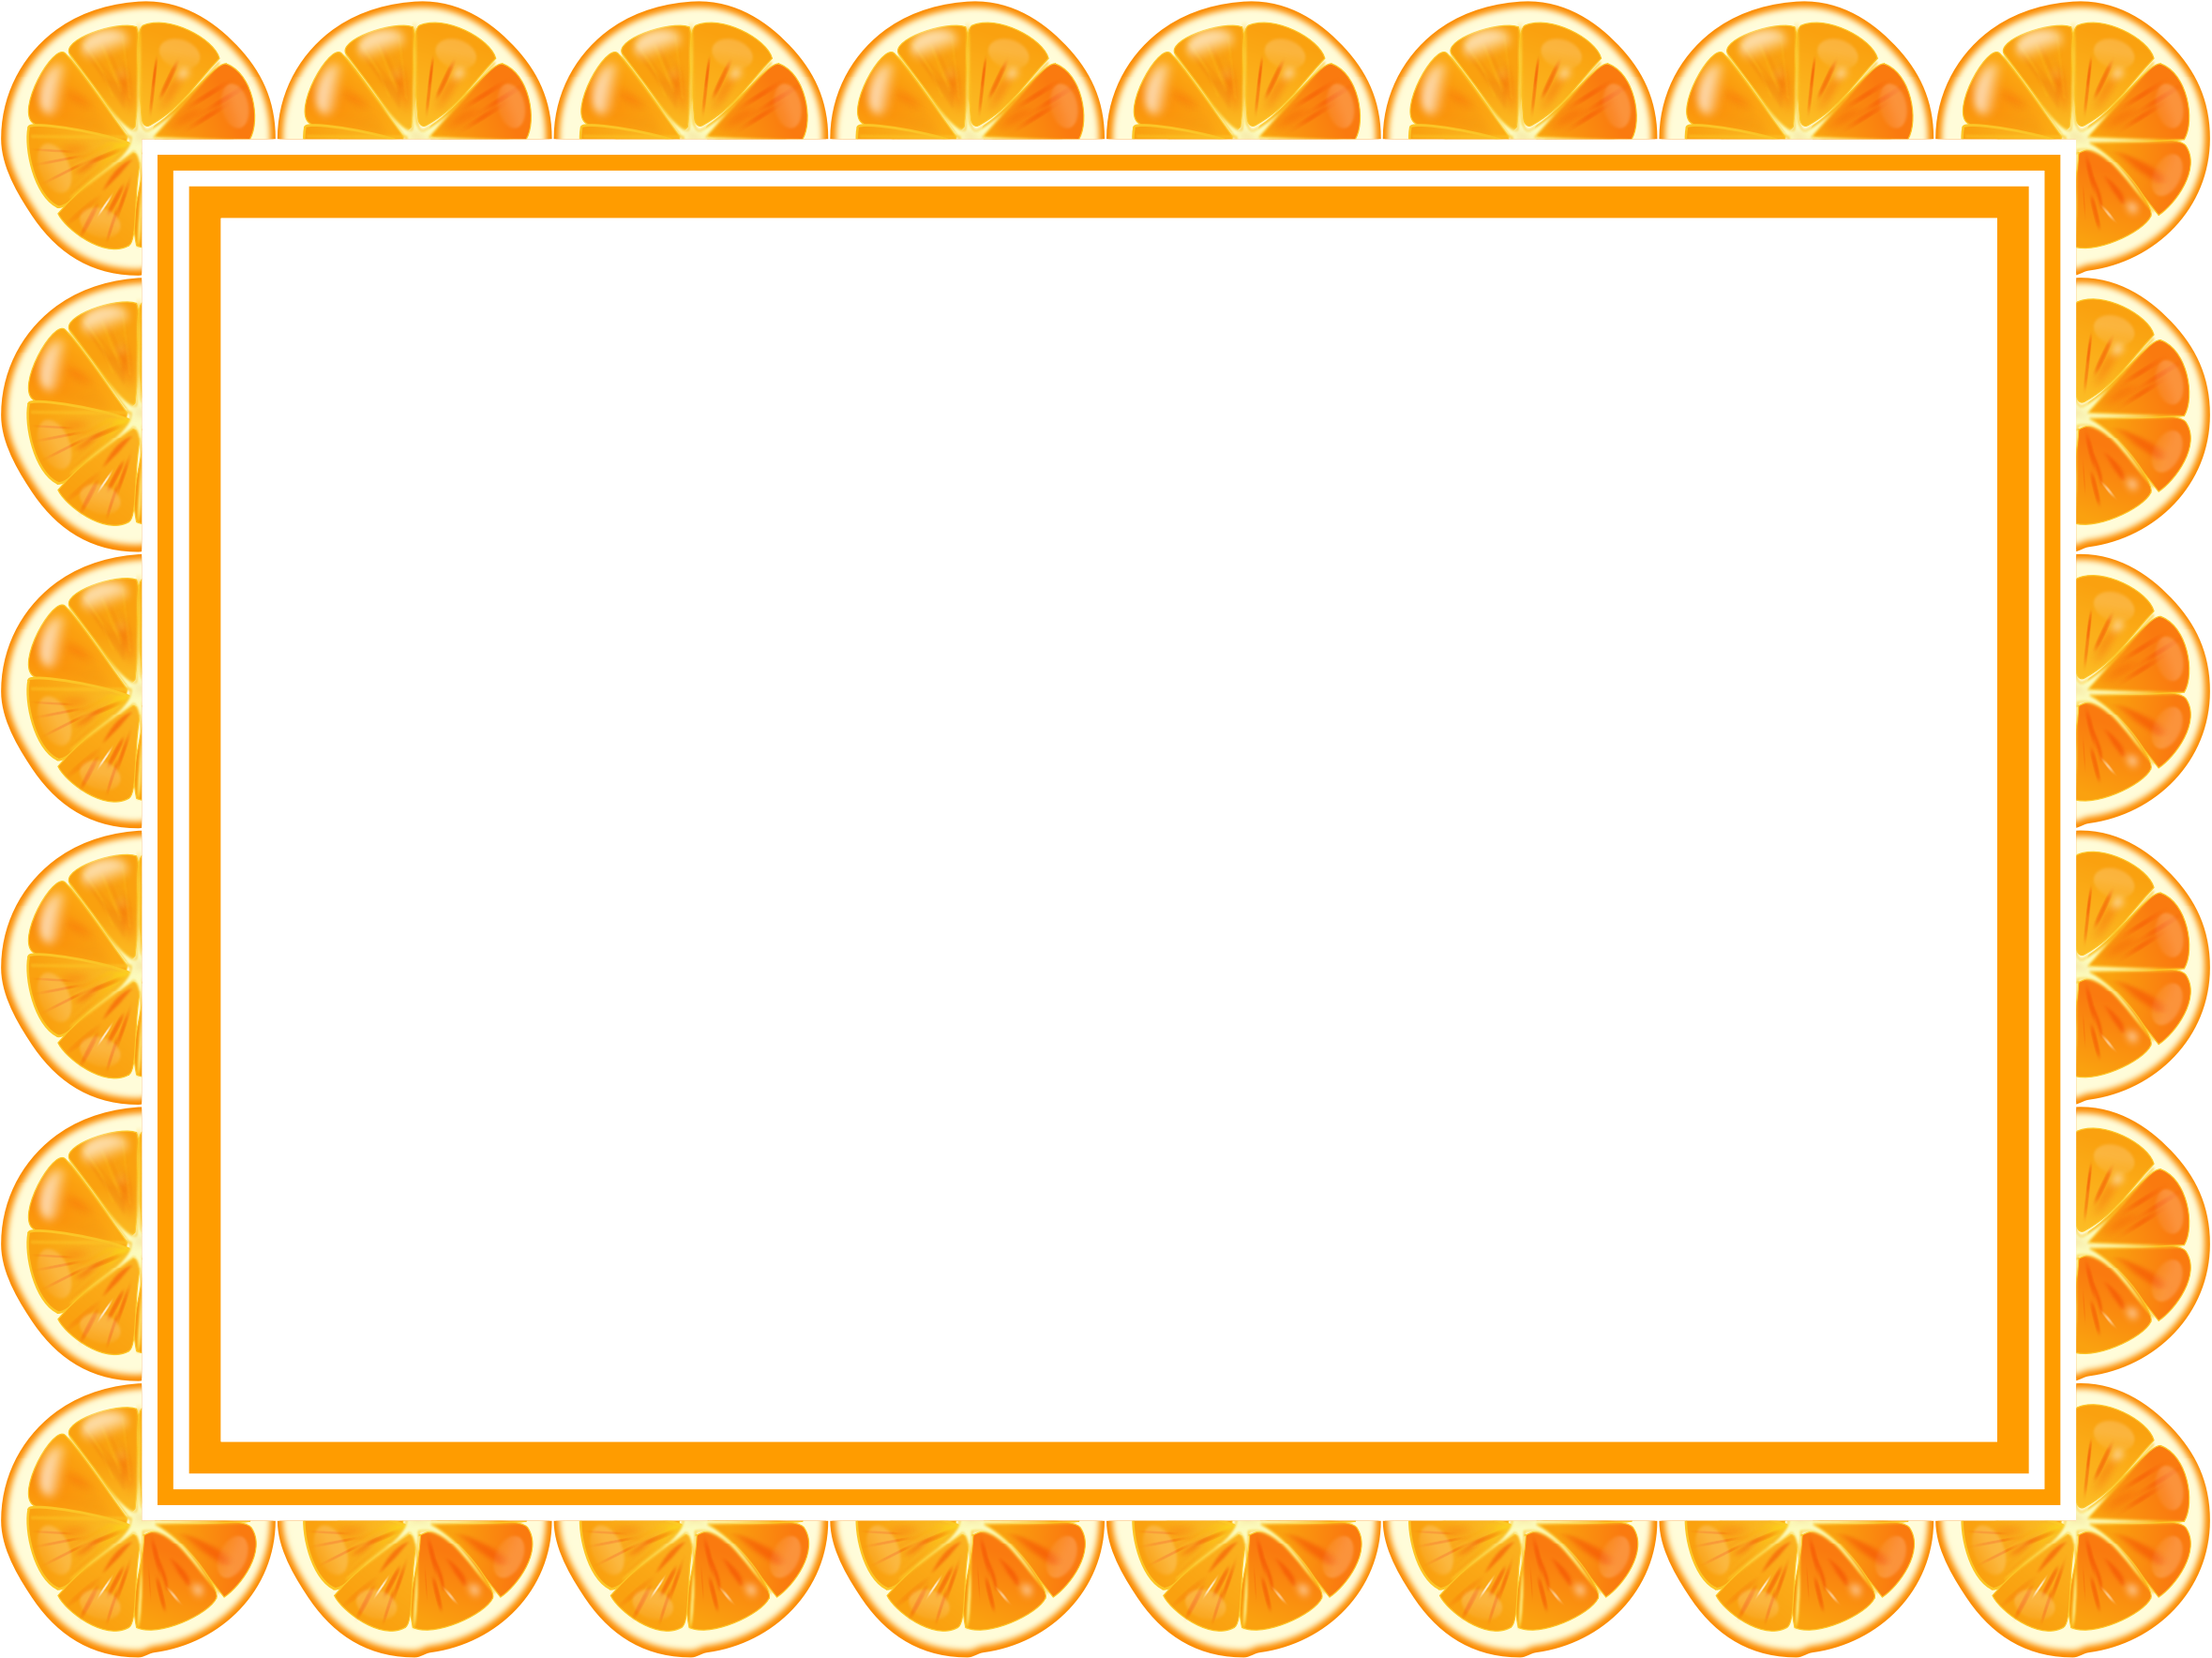 Clipart - Orange slice frame